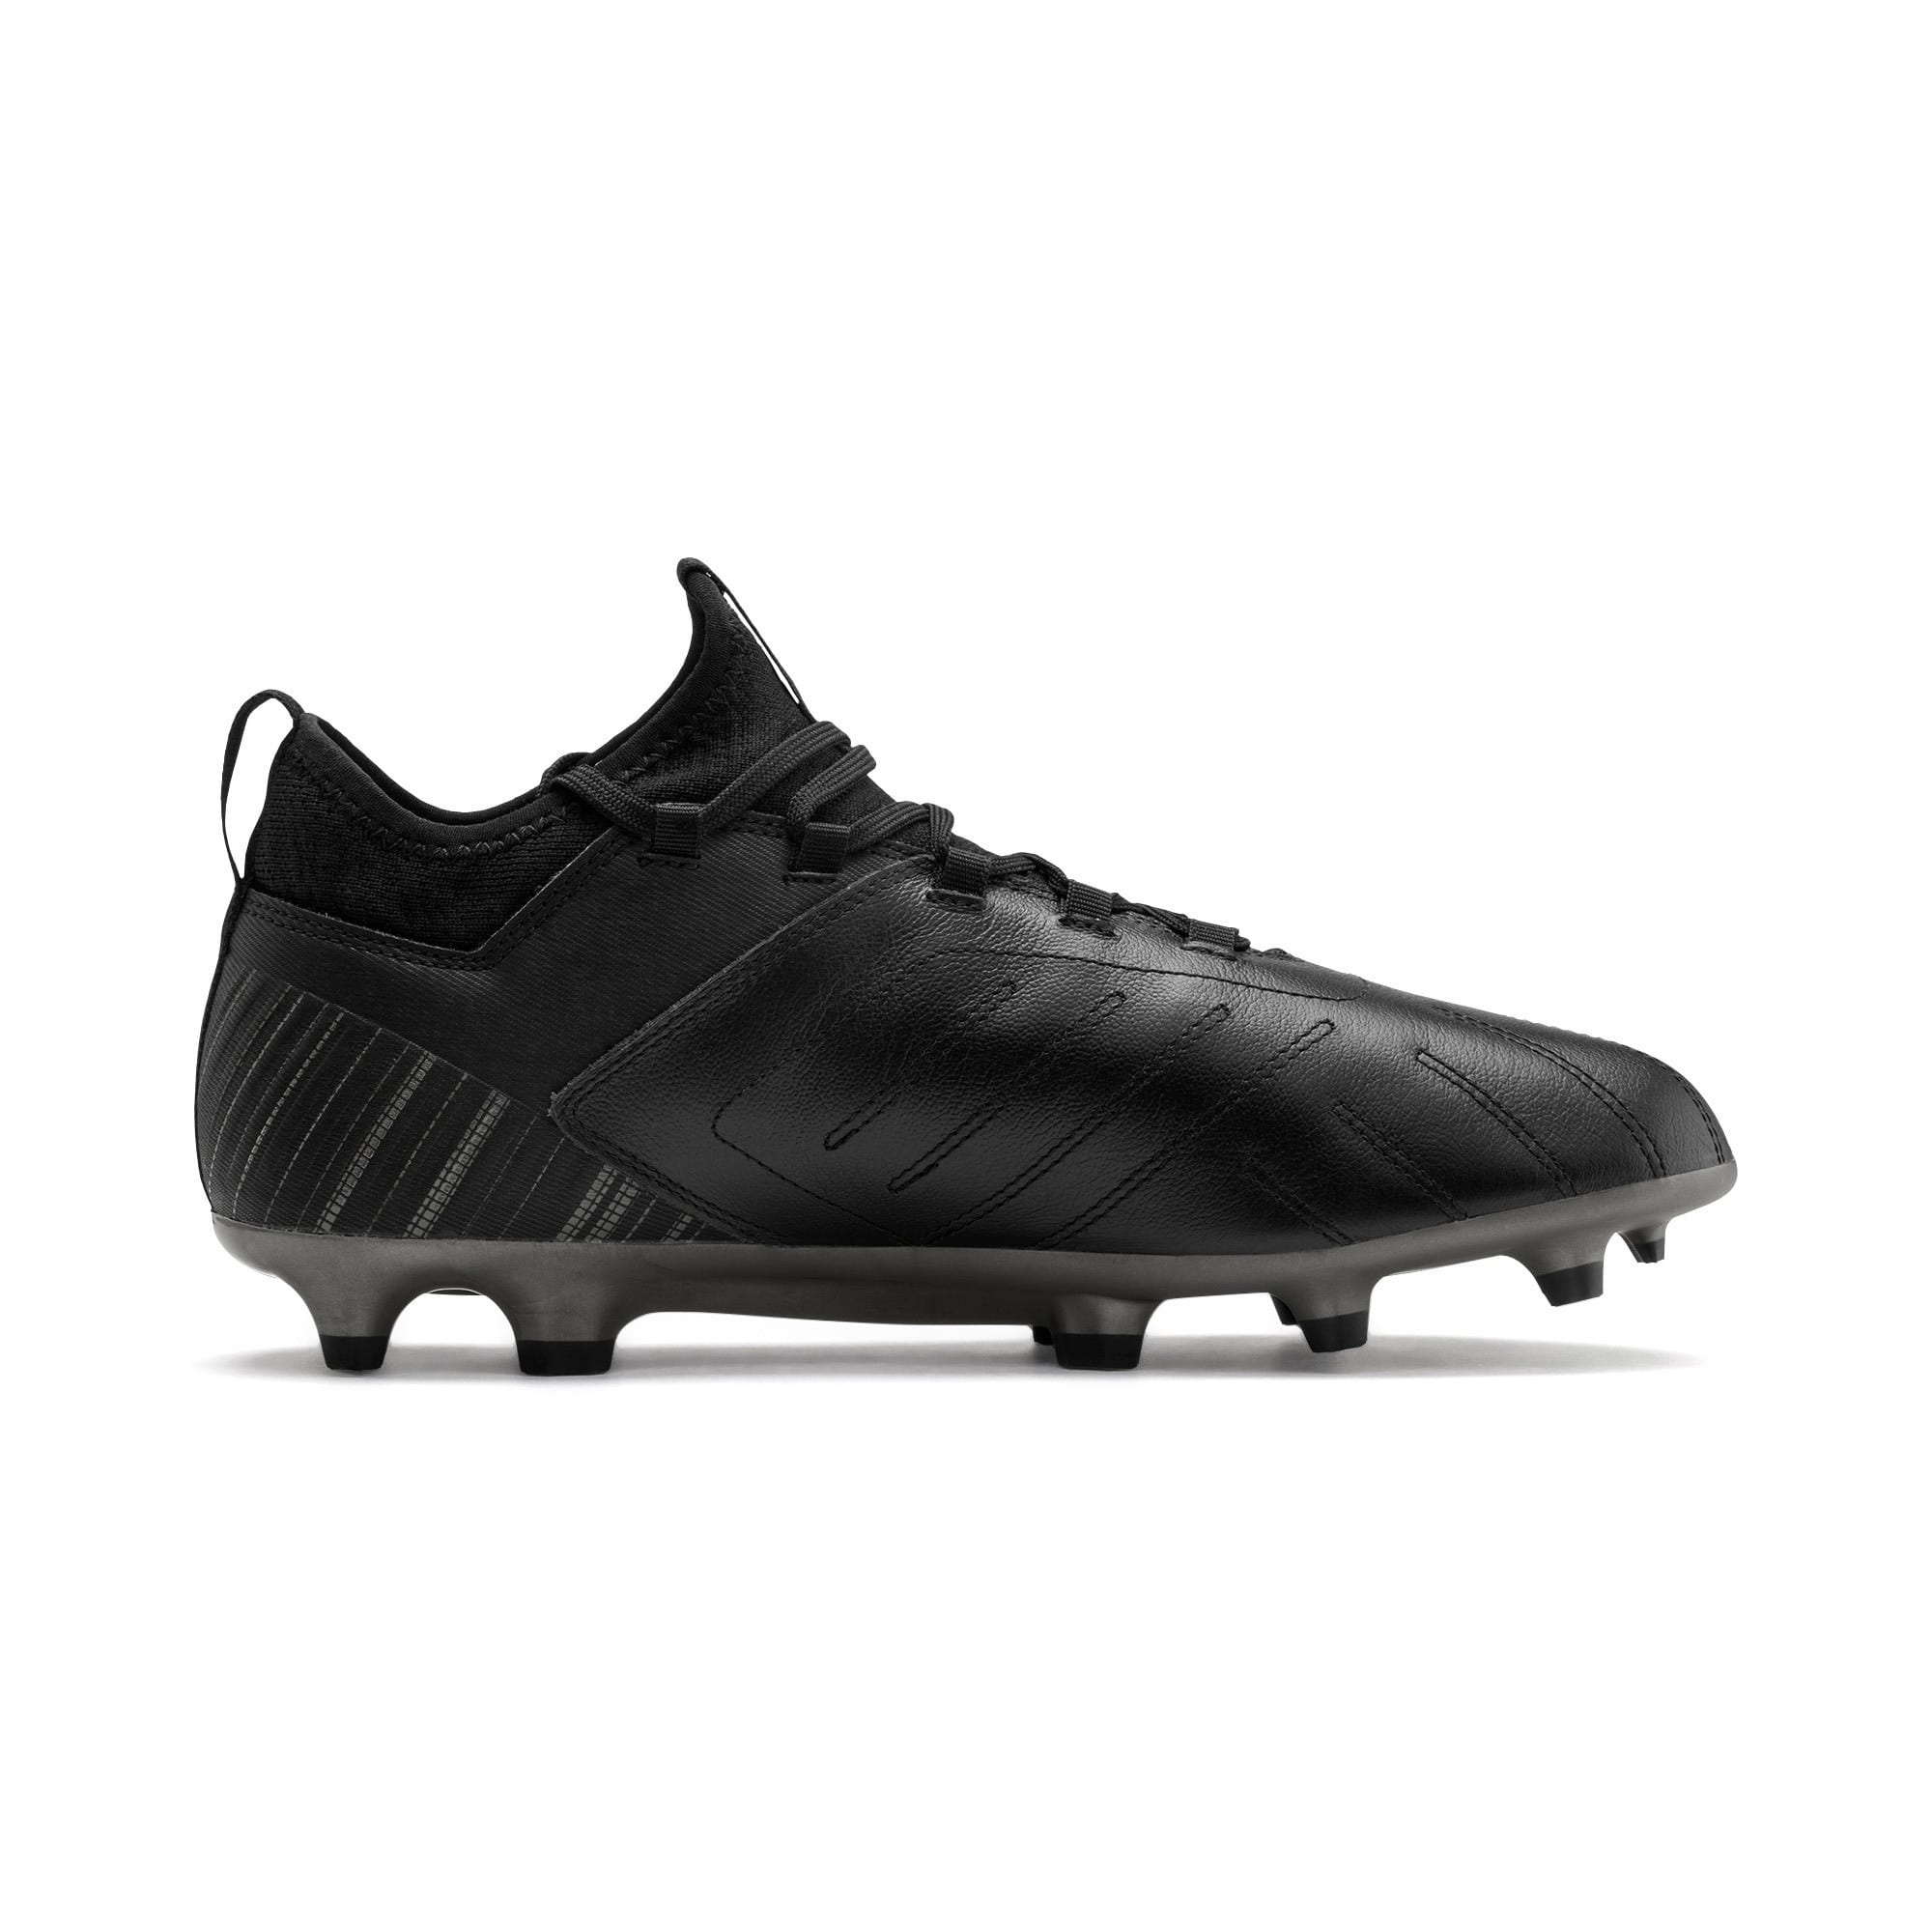 Thumbnail 6 van PUMA ONE 5.3 FG/AG voetbalschoenen voor mannen, Black-Black-Puma Aged Silver, medium